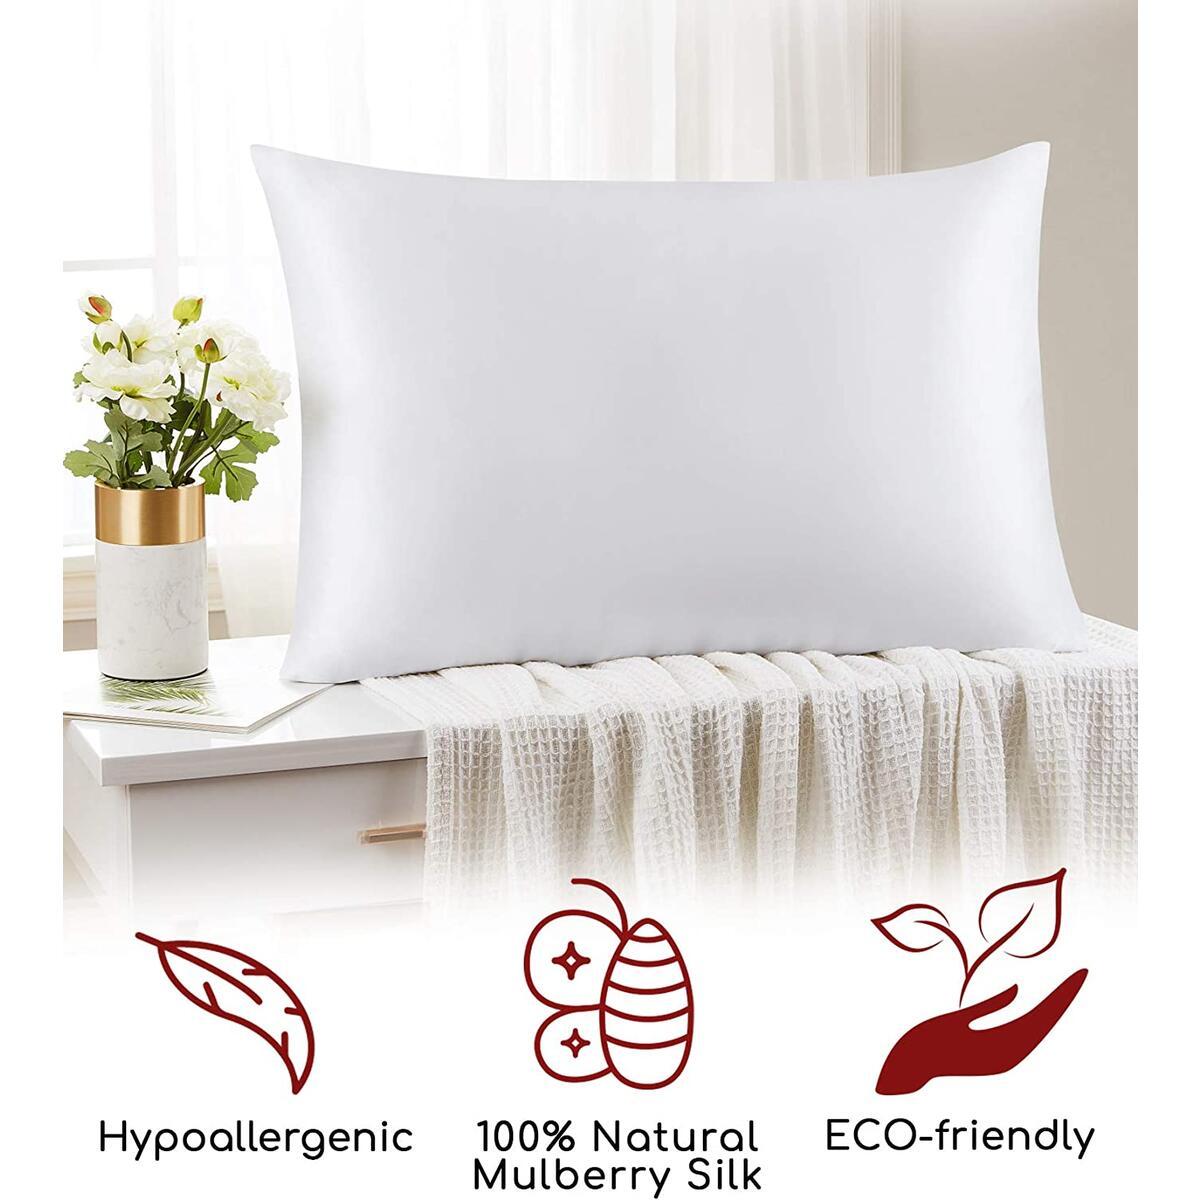 Mellanni Silk Pillowcase for Hair and Skin - Both Sides 100% Pure Natural Mulberry Silk - 19 Momme - Hidden Zipper ClosurePillow Case- (Queen 20